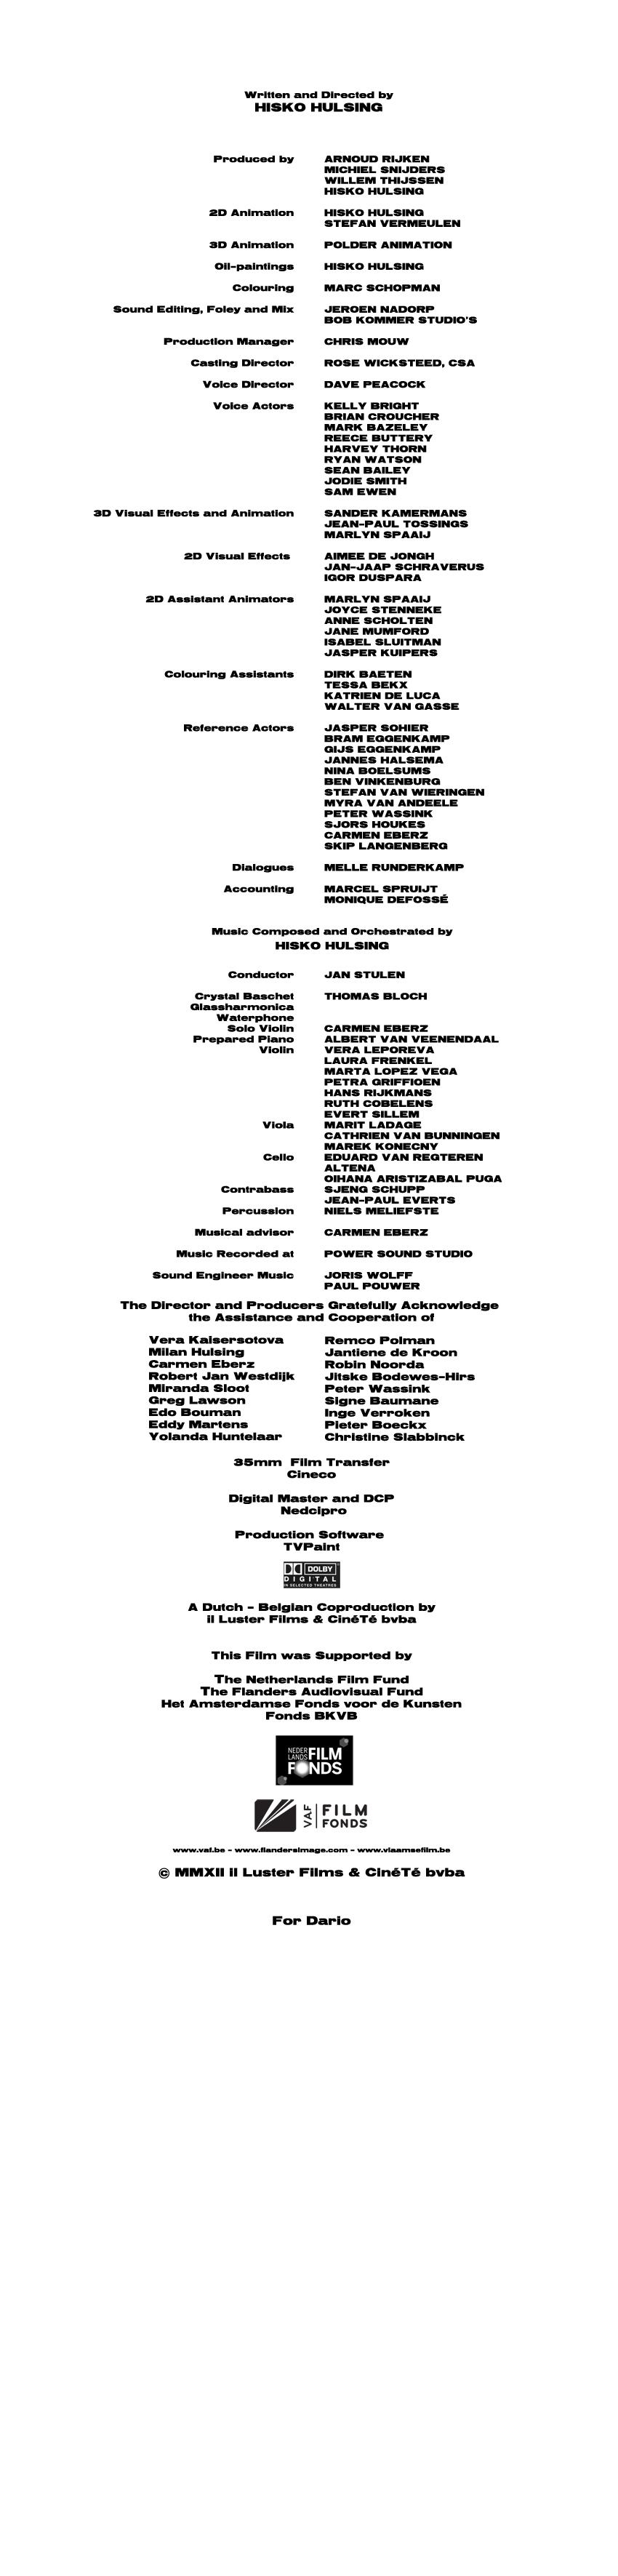 Junkyard - Credits